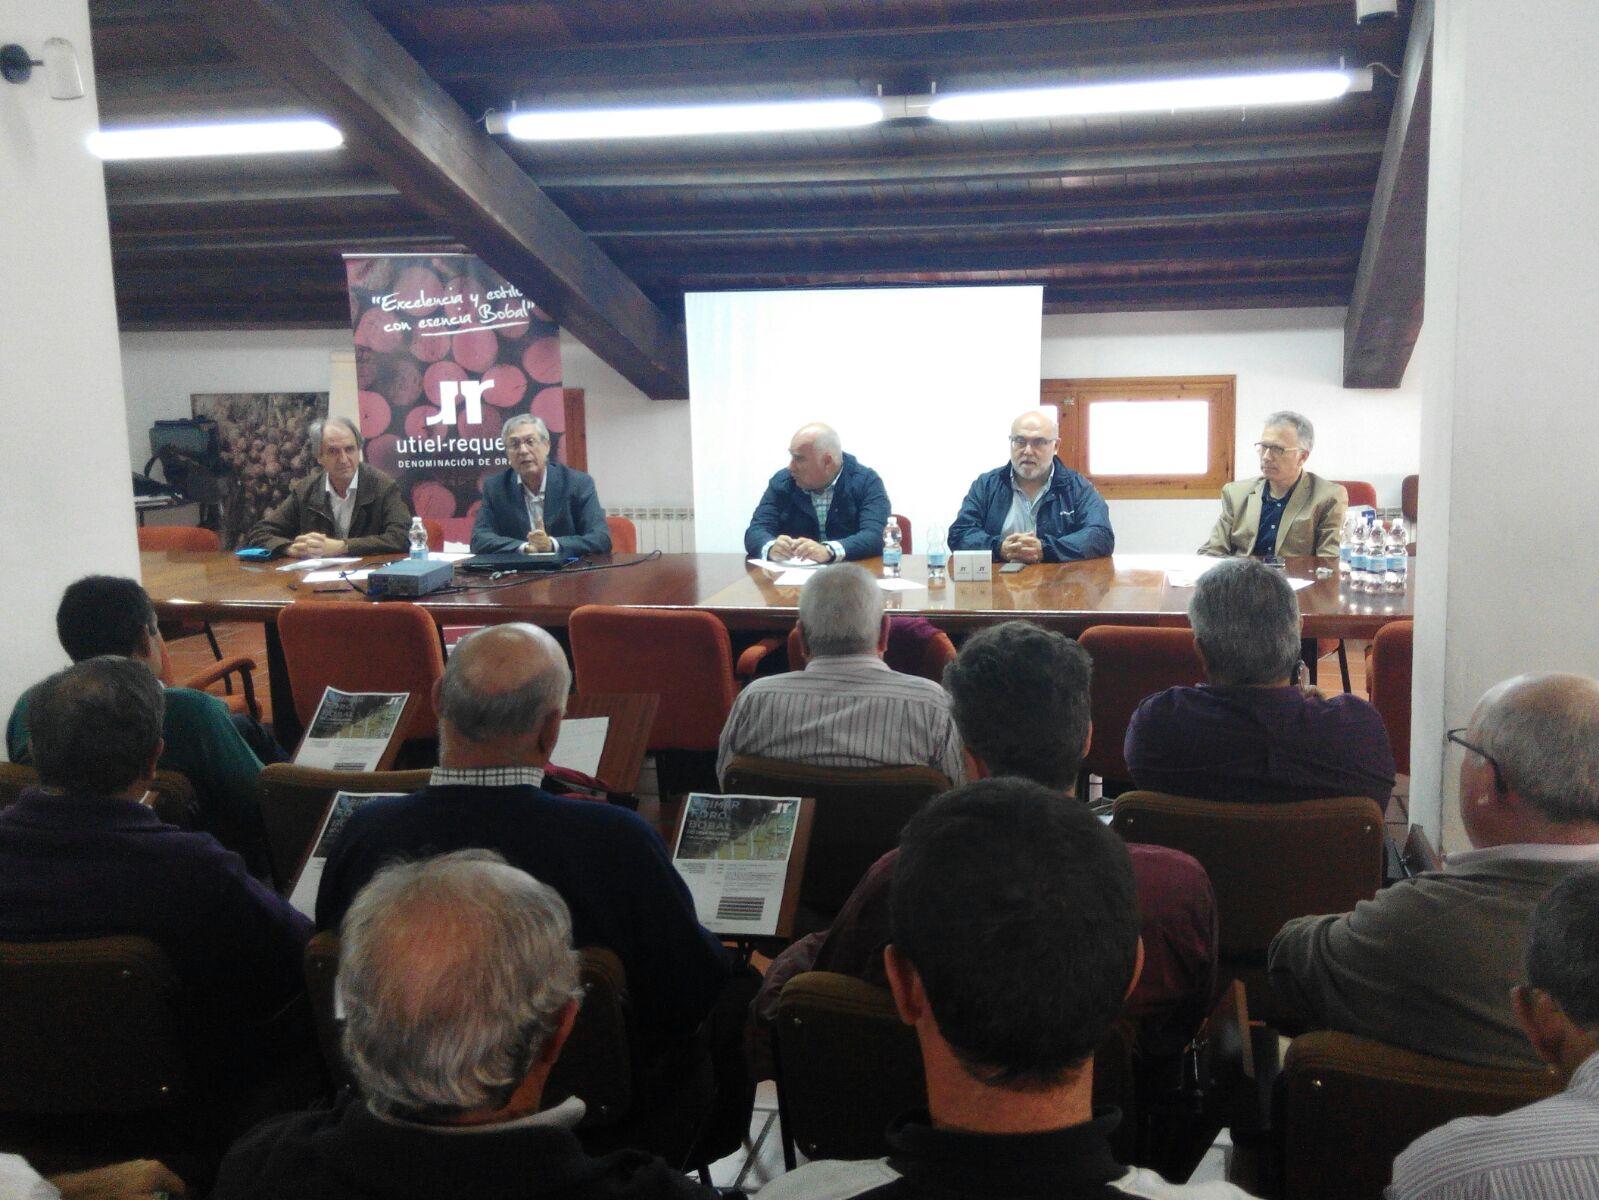 Bodegas cooperativas de Utiel Requena se unen para comercializar 800.000 hl. de vino a granel